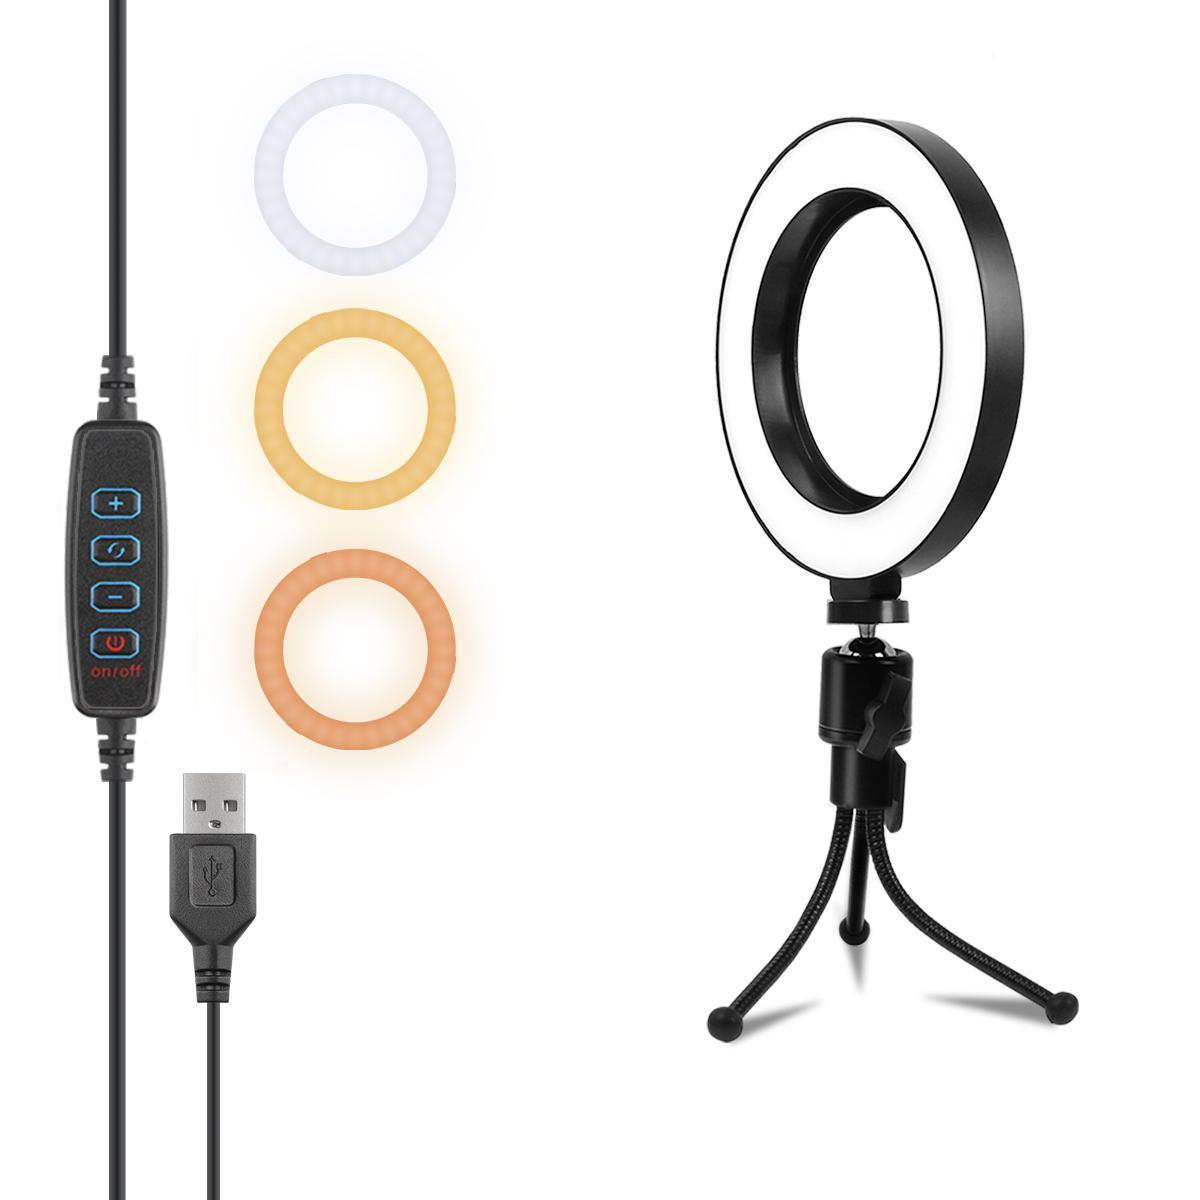 LED حلقة الضوء، 6 بوصة ماكياج خفيف، خاتم الخفيفة مع ترايبود حامل ليوتيوب فيديو اطلاق النار الخفيفة